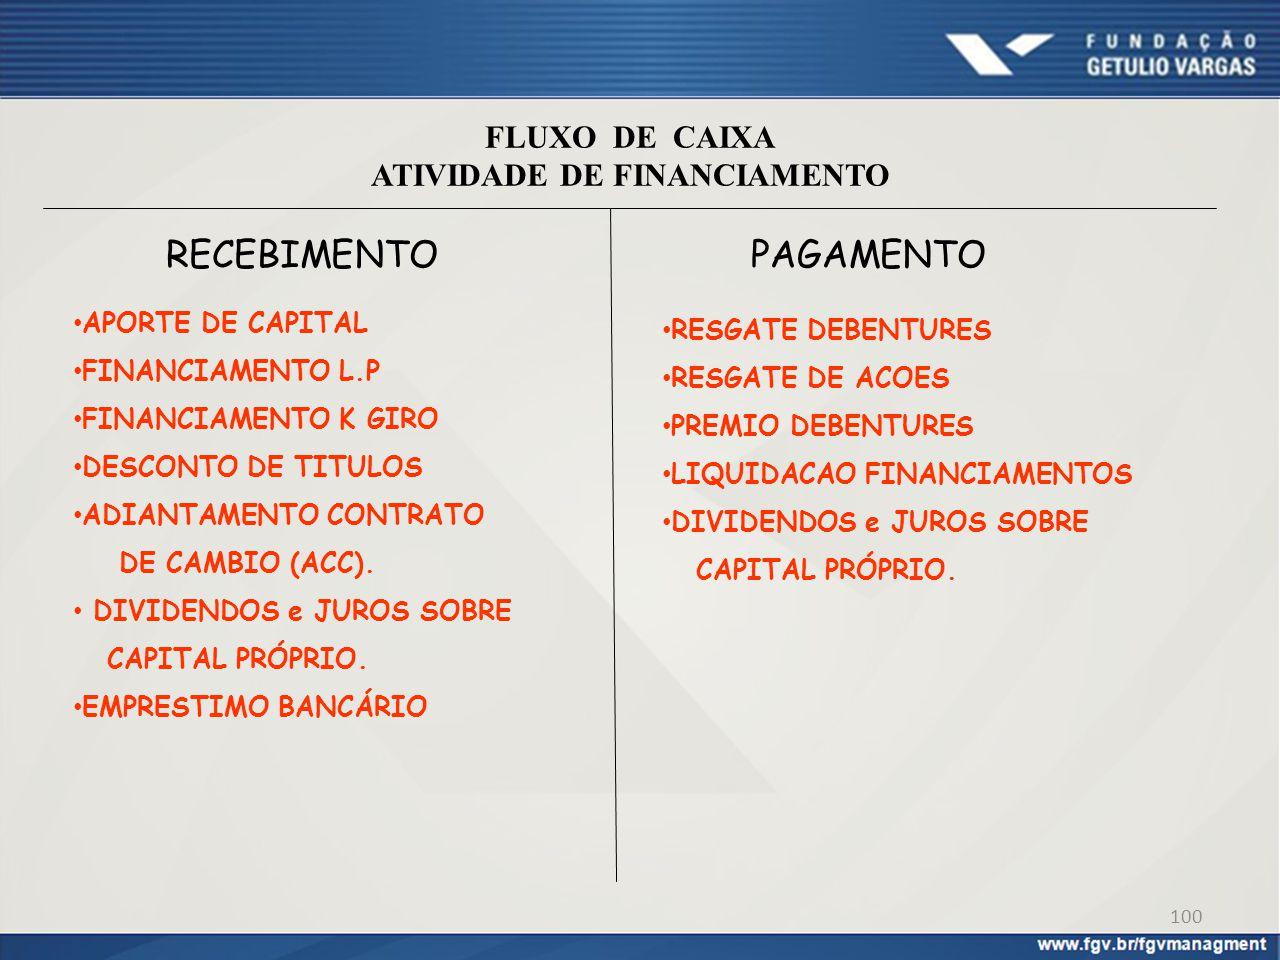 100 FLUXO DE CAIXA ATIVIDADE DE FINANCIAMENTO APORTE DE CAPITAL FINANCIAMENTO L.P FINANCIAMENTO K GIRO DESCONTO DE TITULOS ADIANTAMENTO CONTRATO DE CA